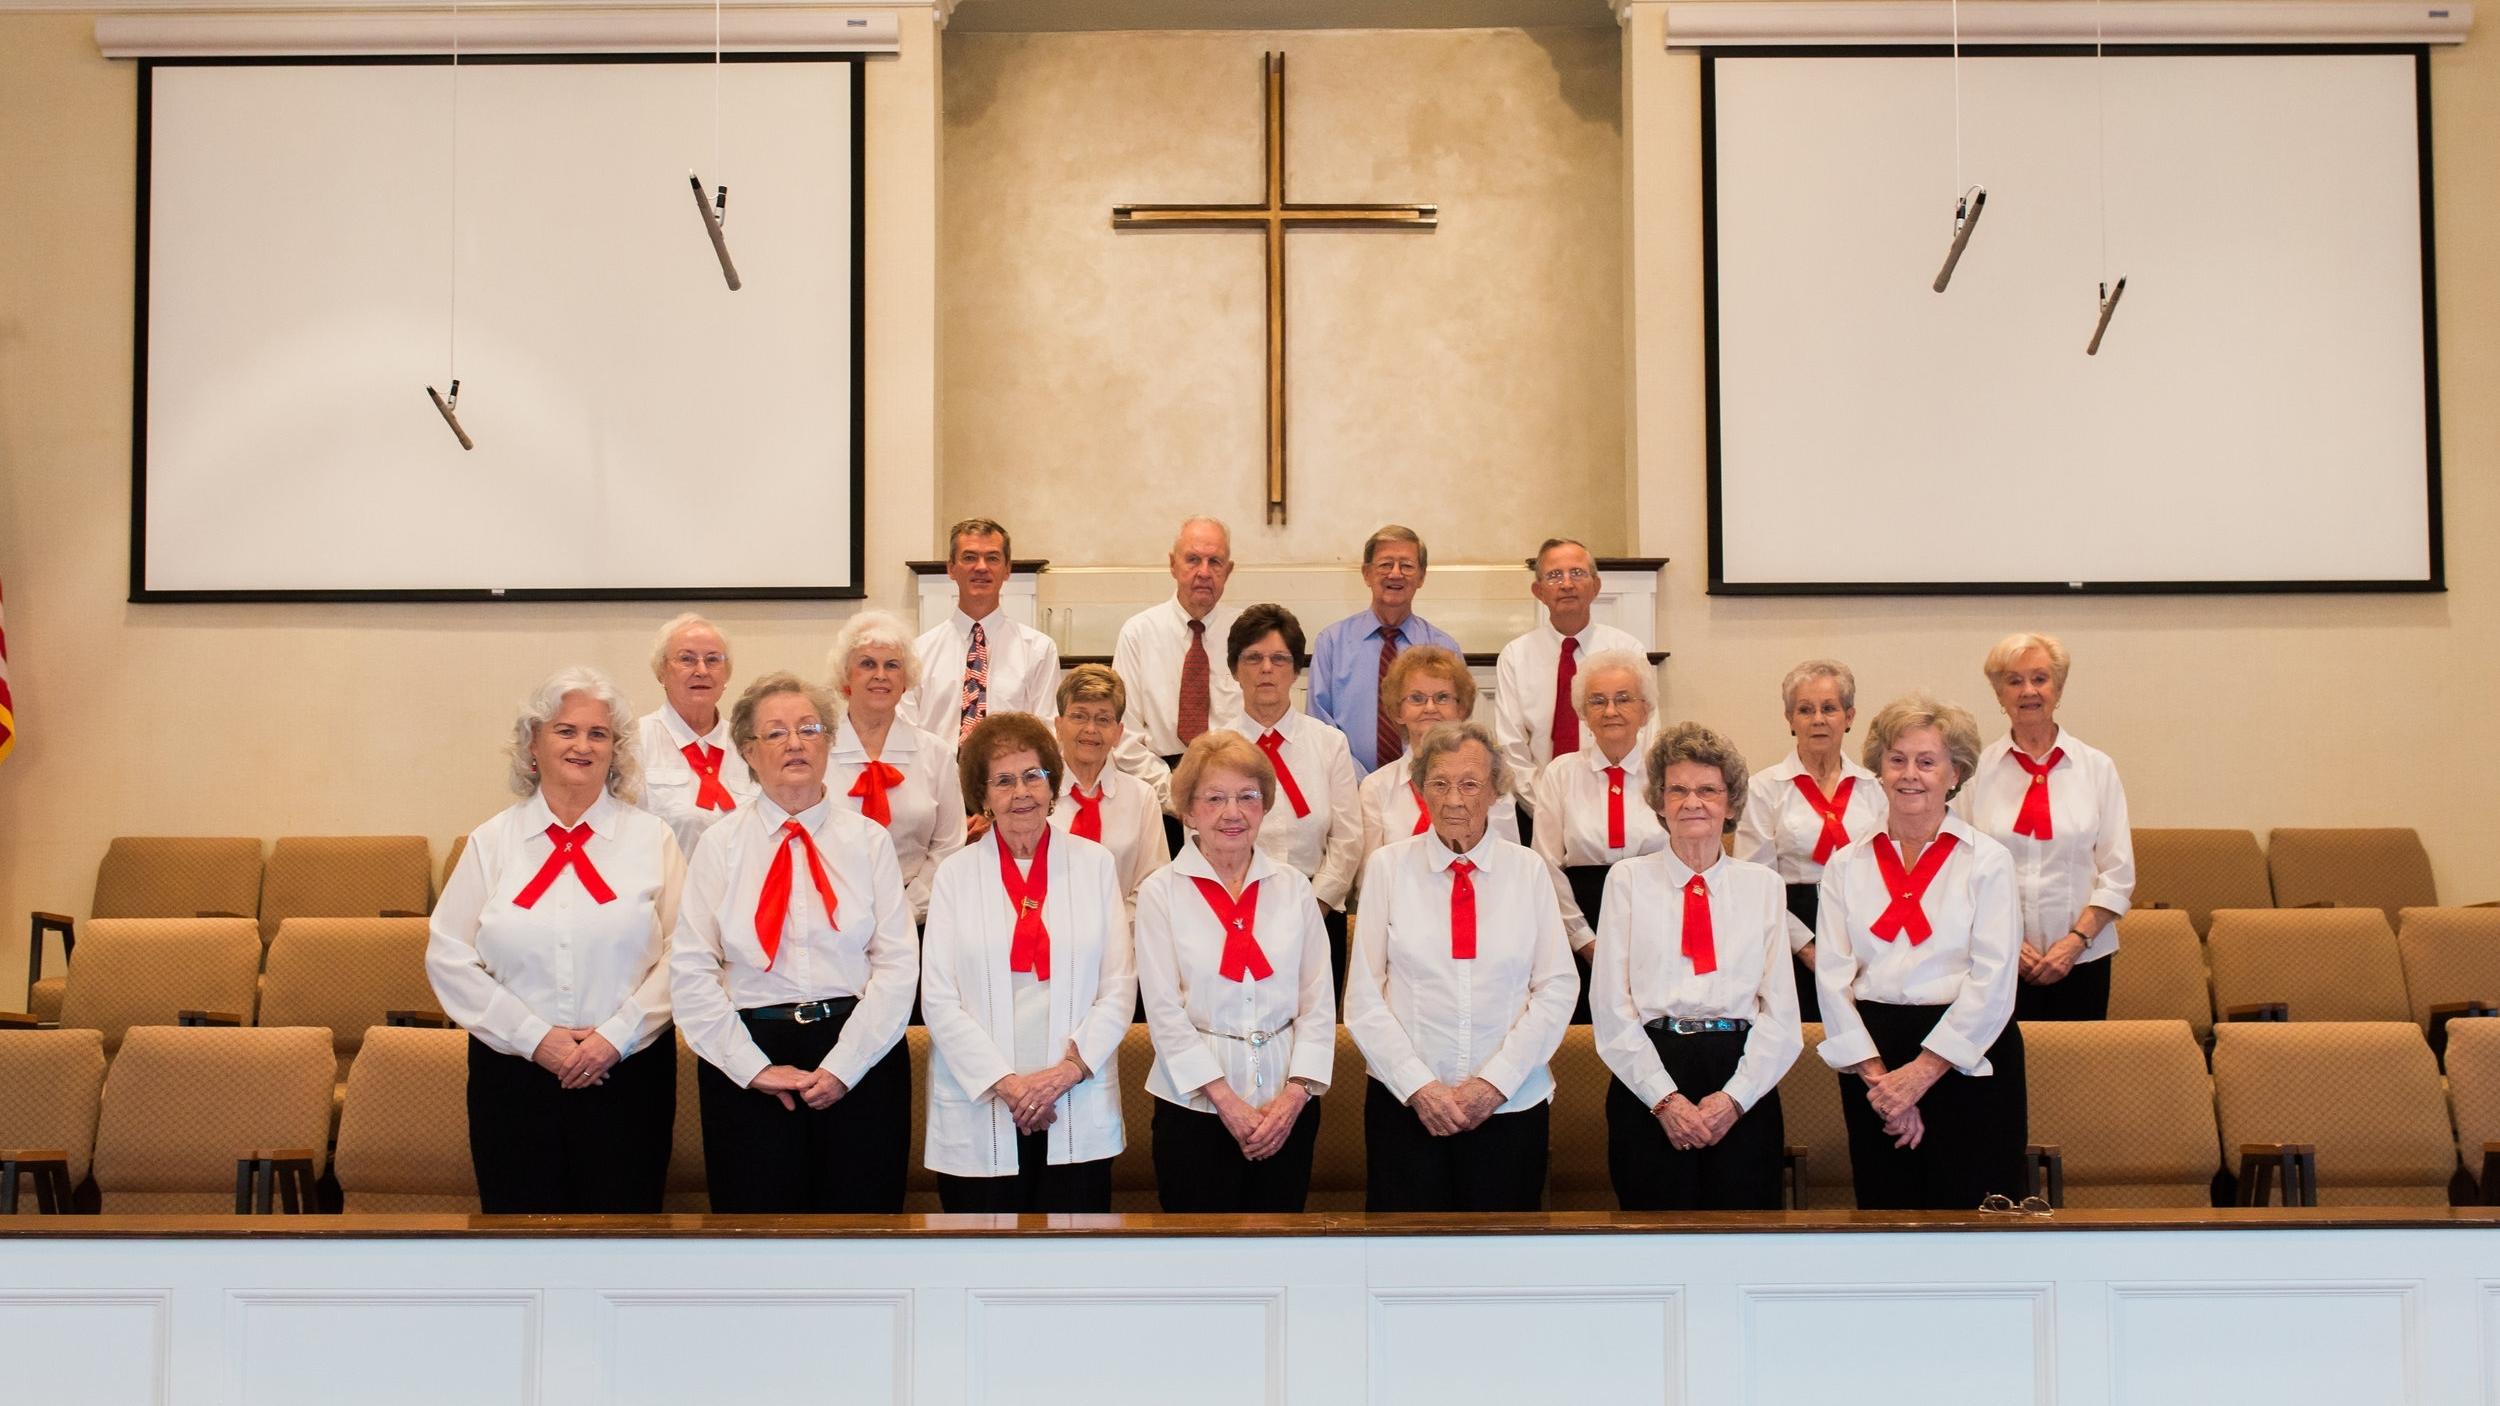 Senior Adult Choir - The